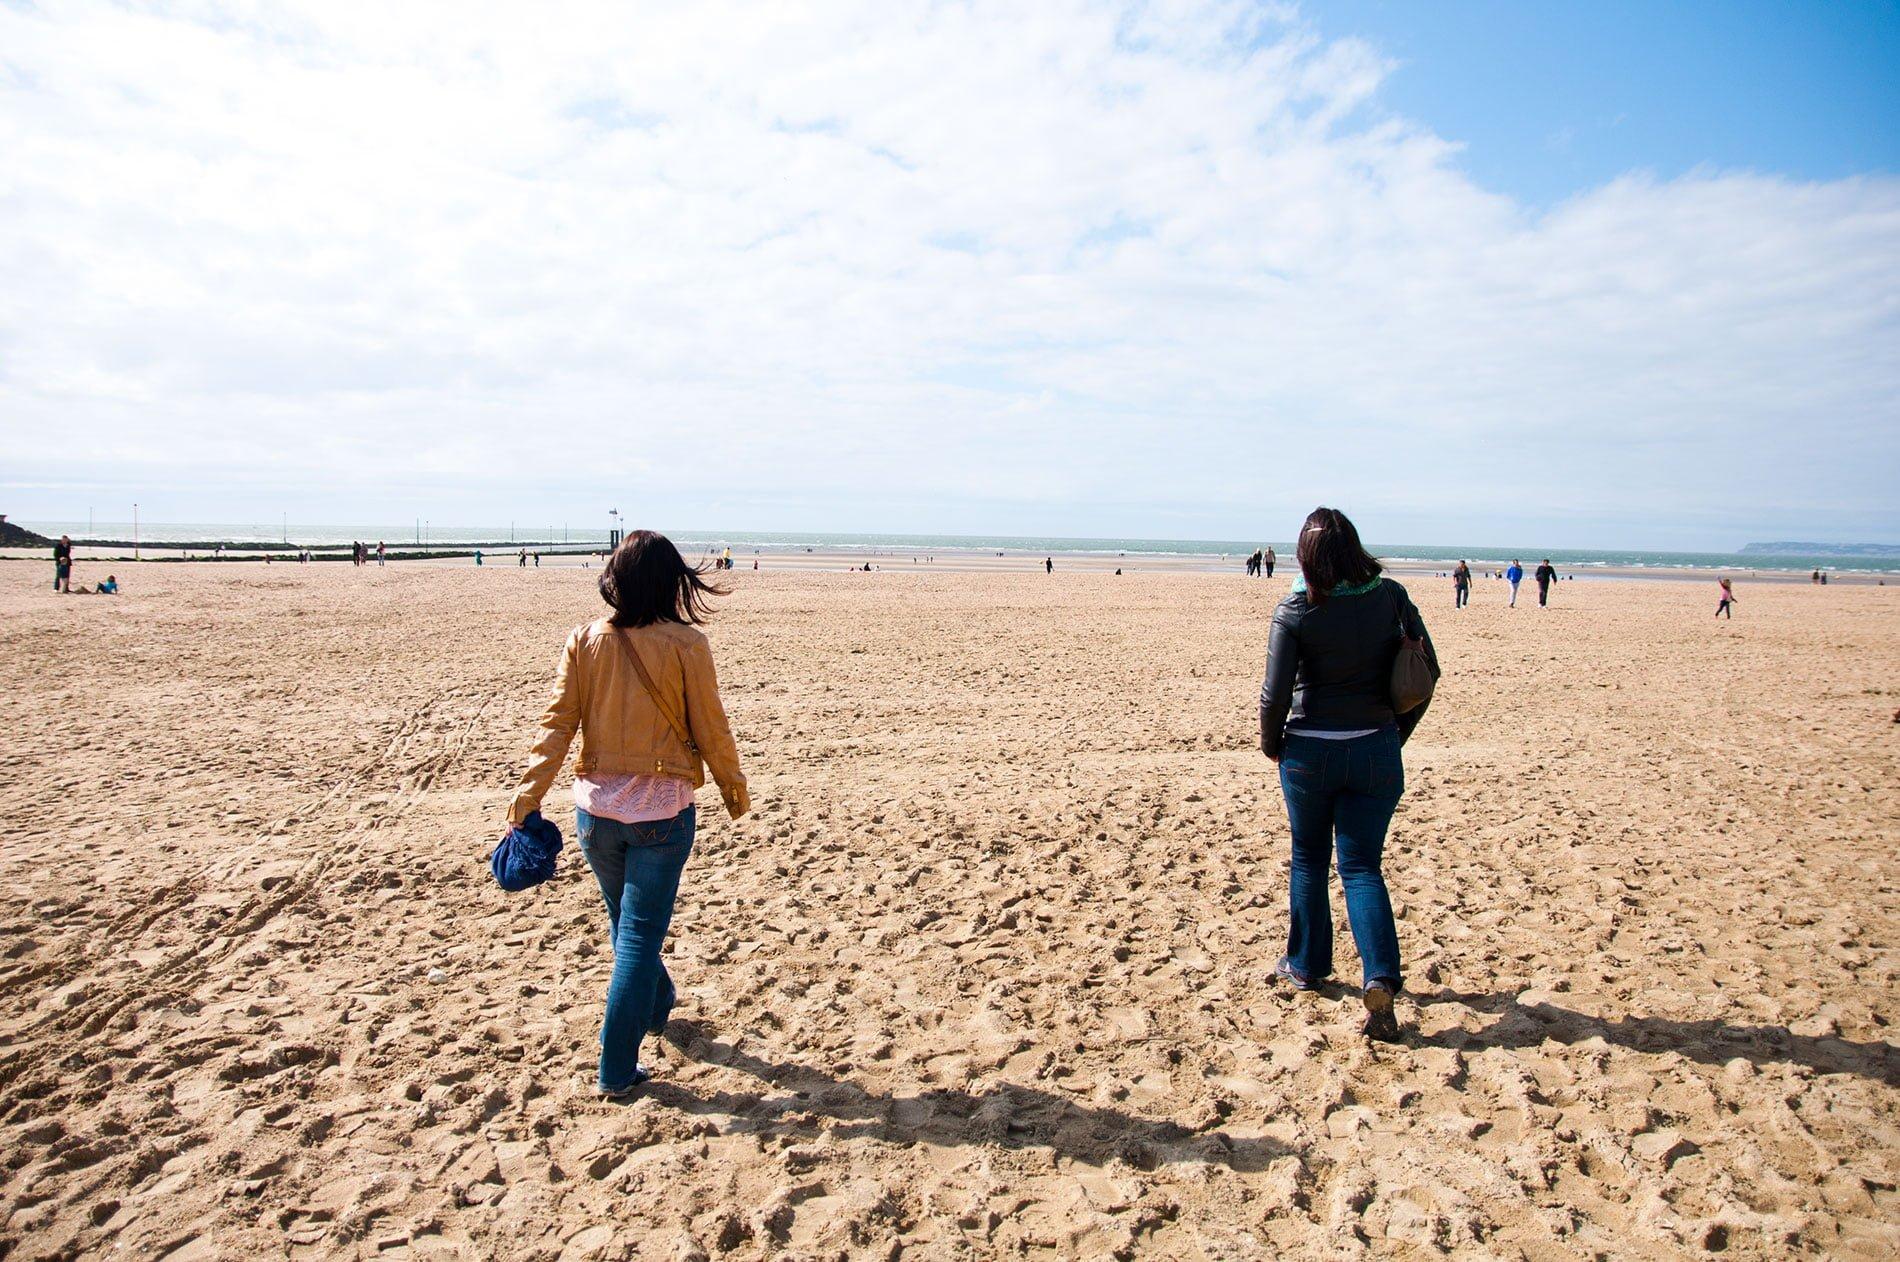 Plage de Trouville en Normandie - 22 v'la Scarlett